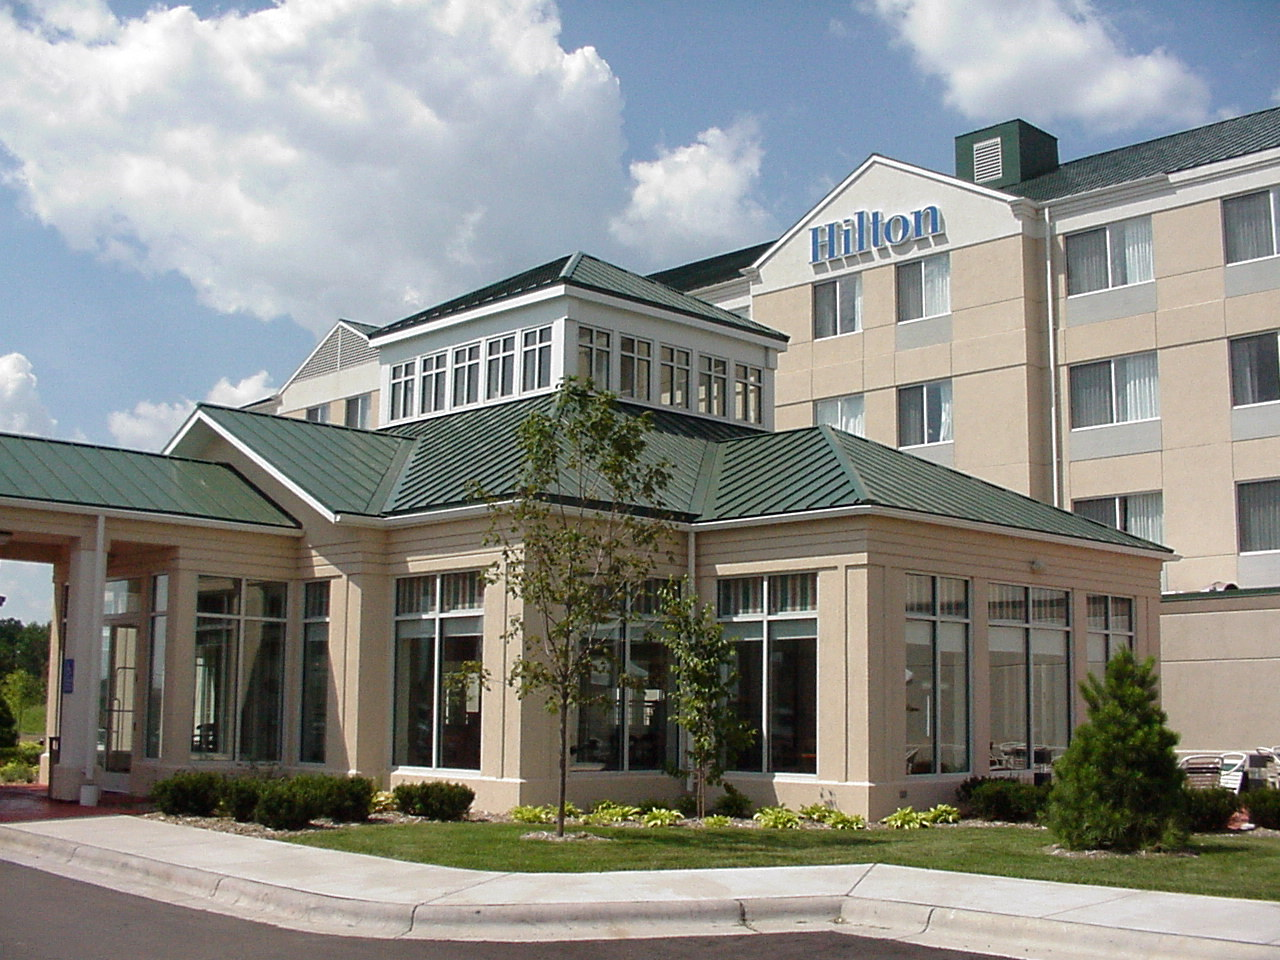 Outside view of the Hilton Garden inn in Shoreview, MN